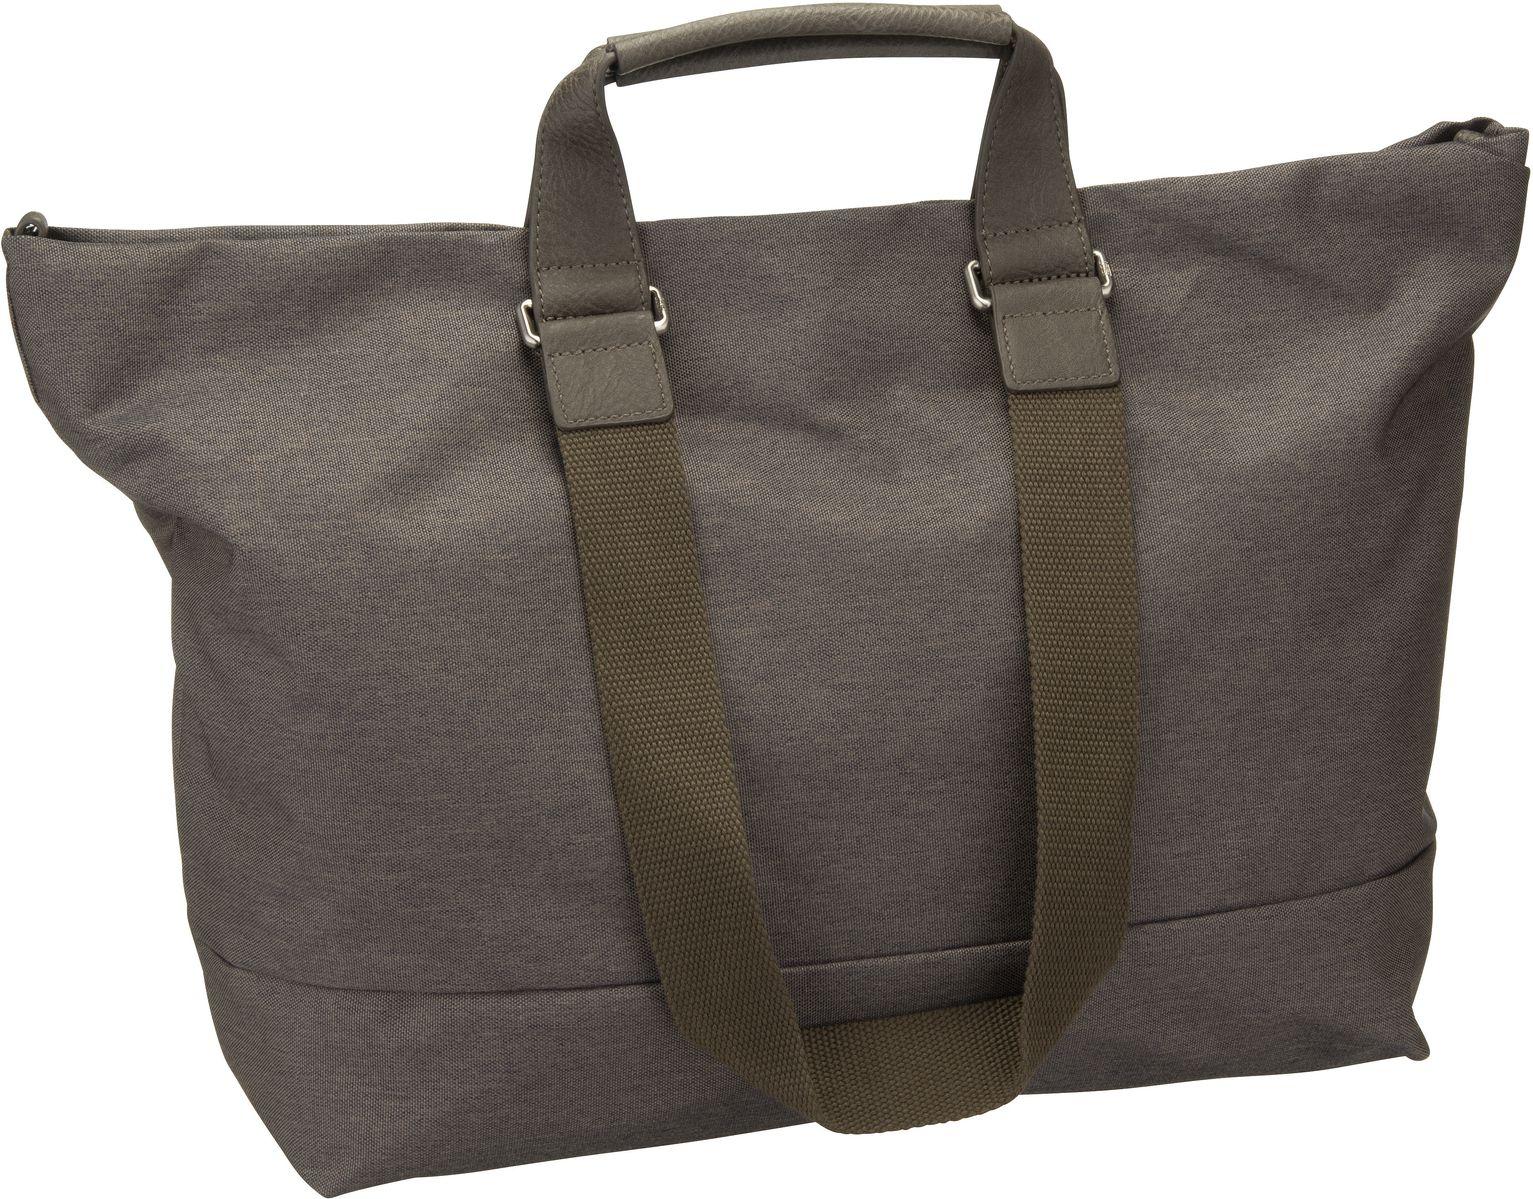 Handtasche Bergen 1109 Shopper Taupe